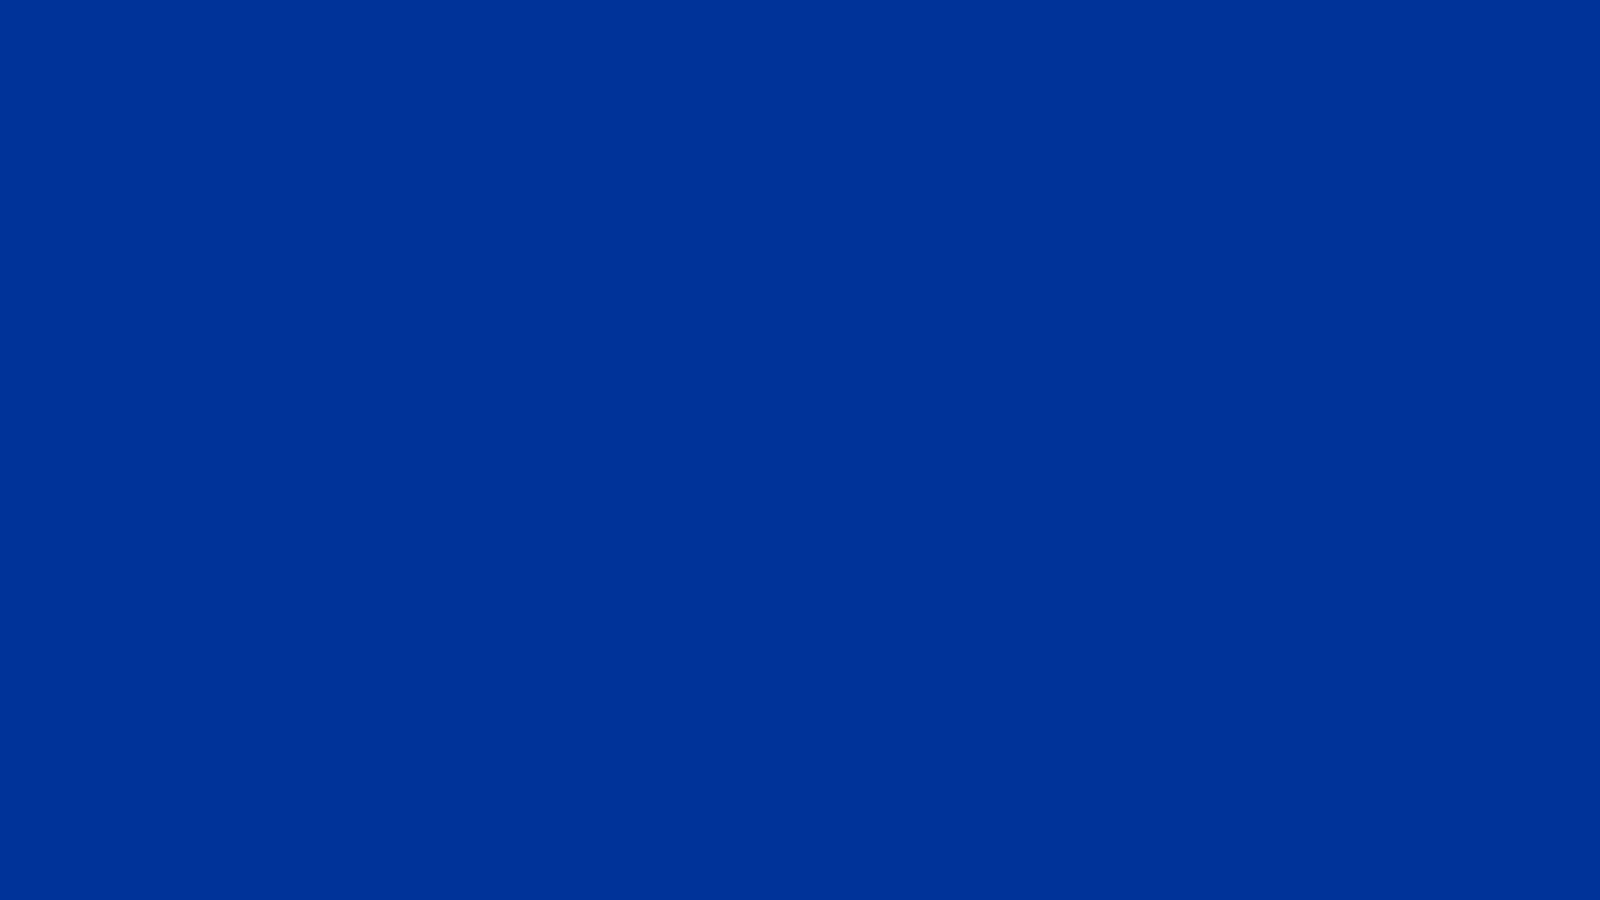 1600x900 Smalt Dark Powder Blue Solid Color Background